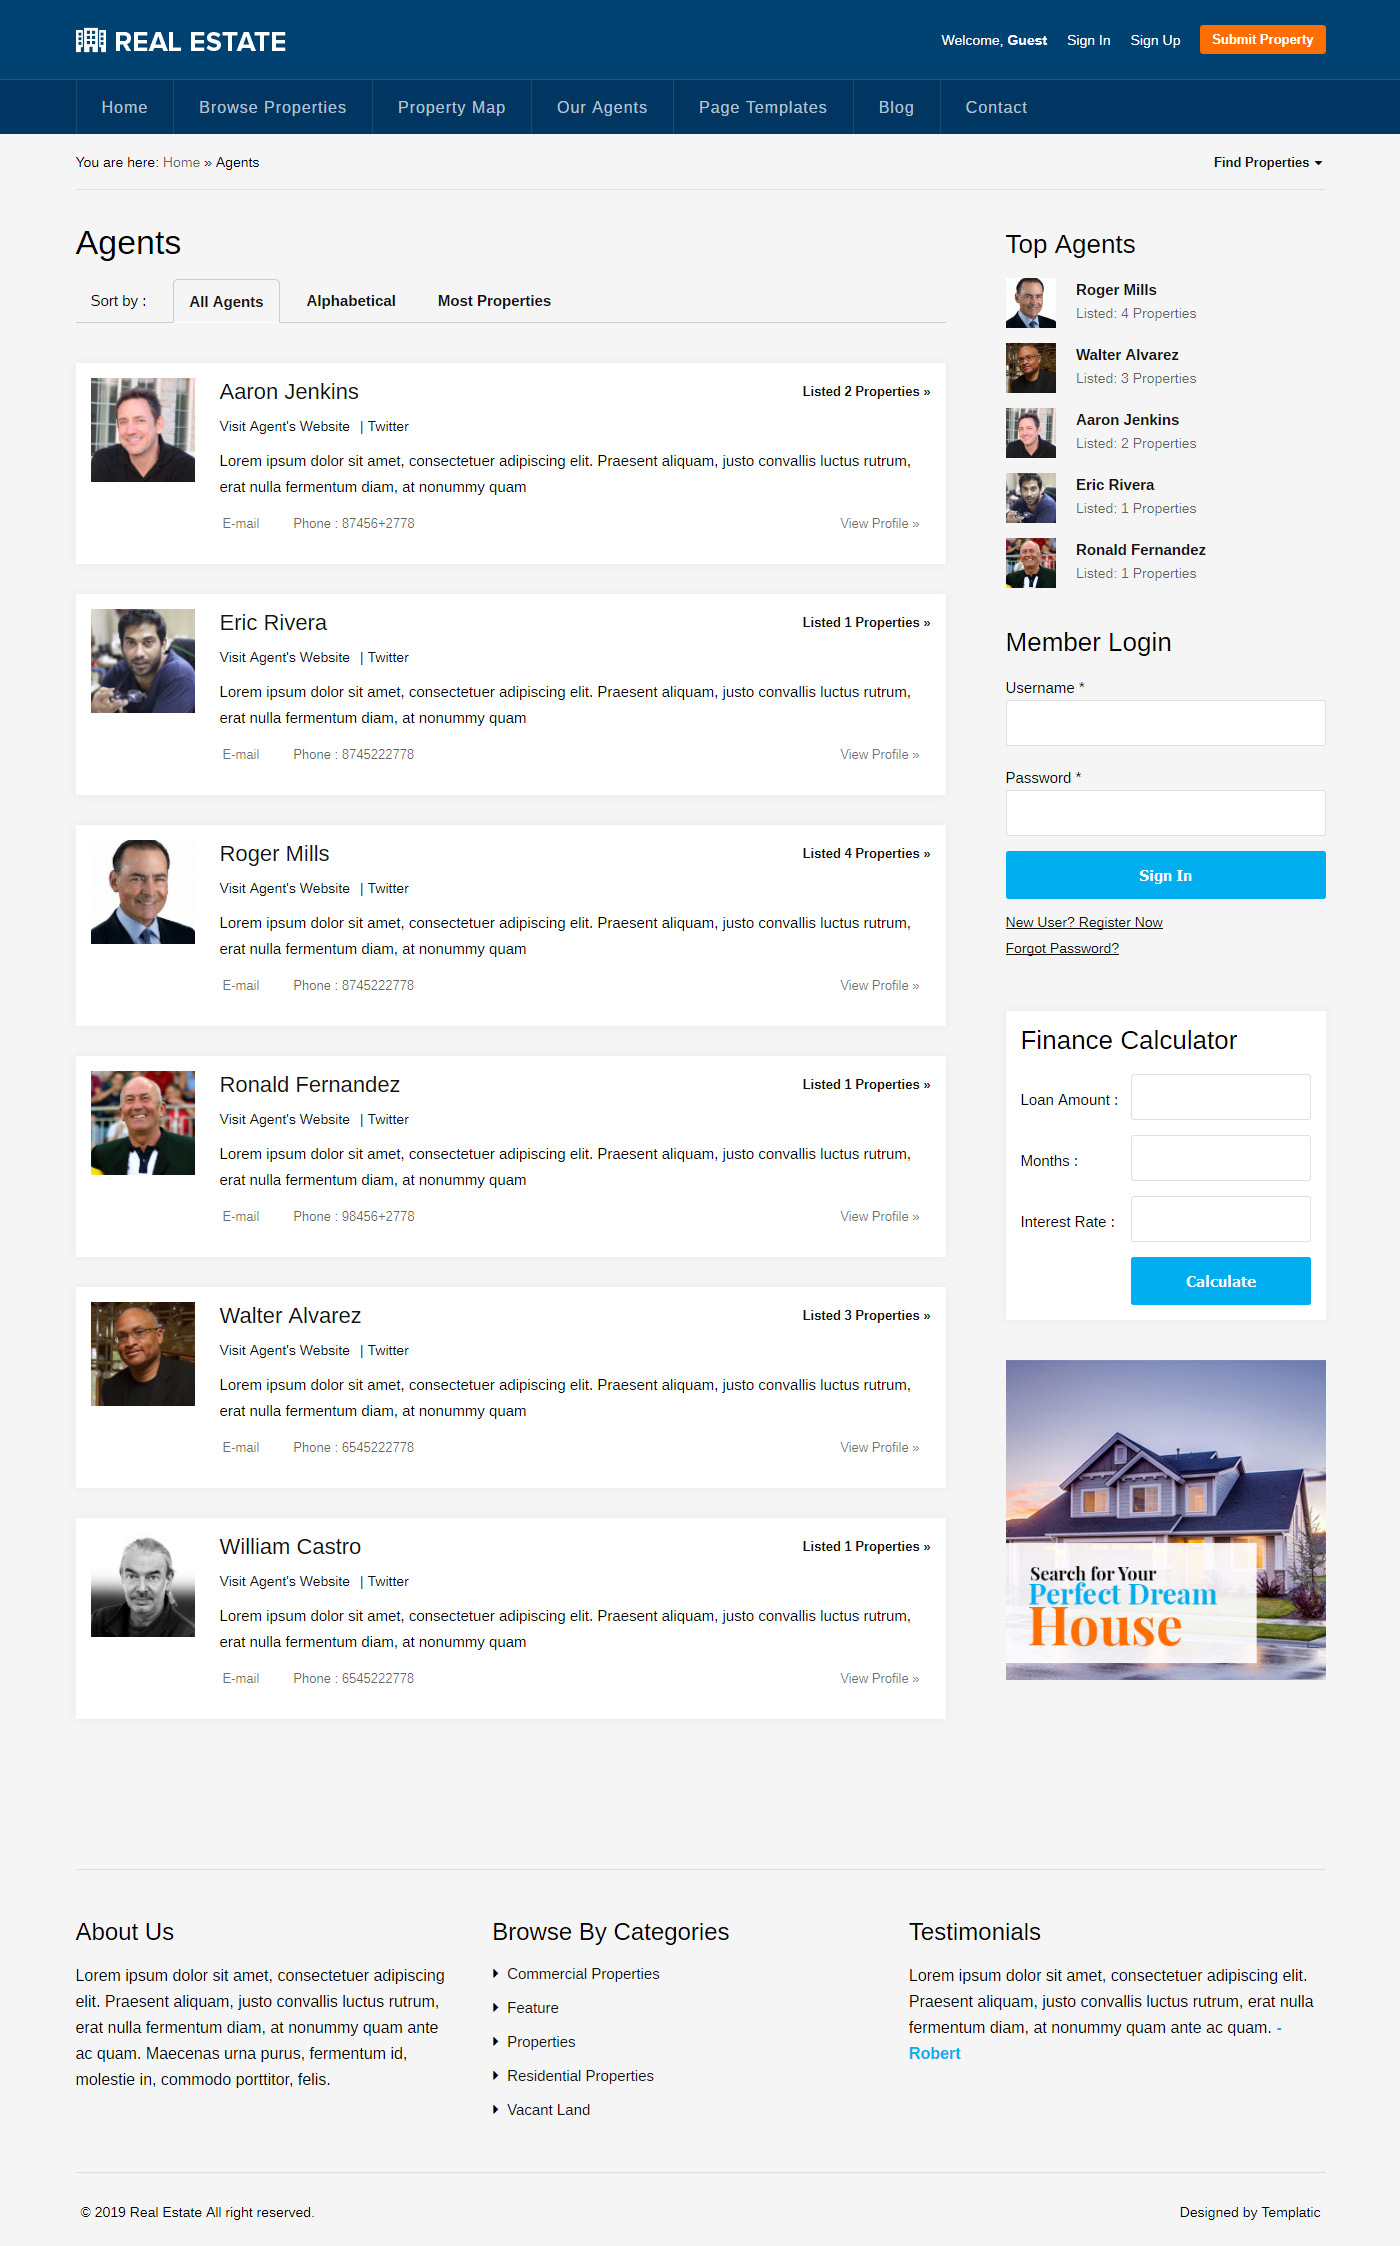 Best Real Estate WordPress Theme [2019] | Property Listings